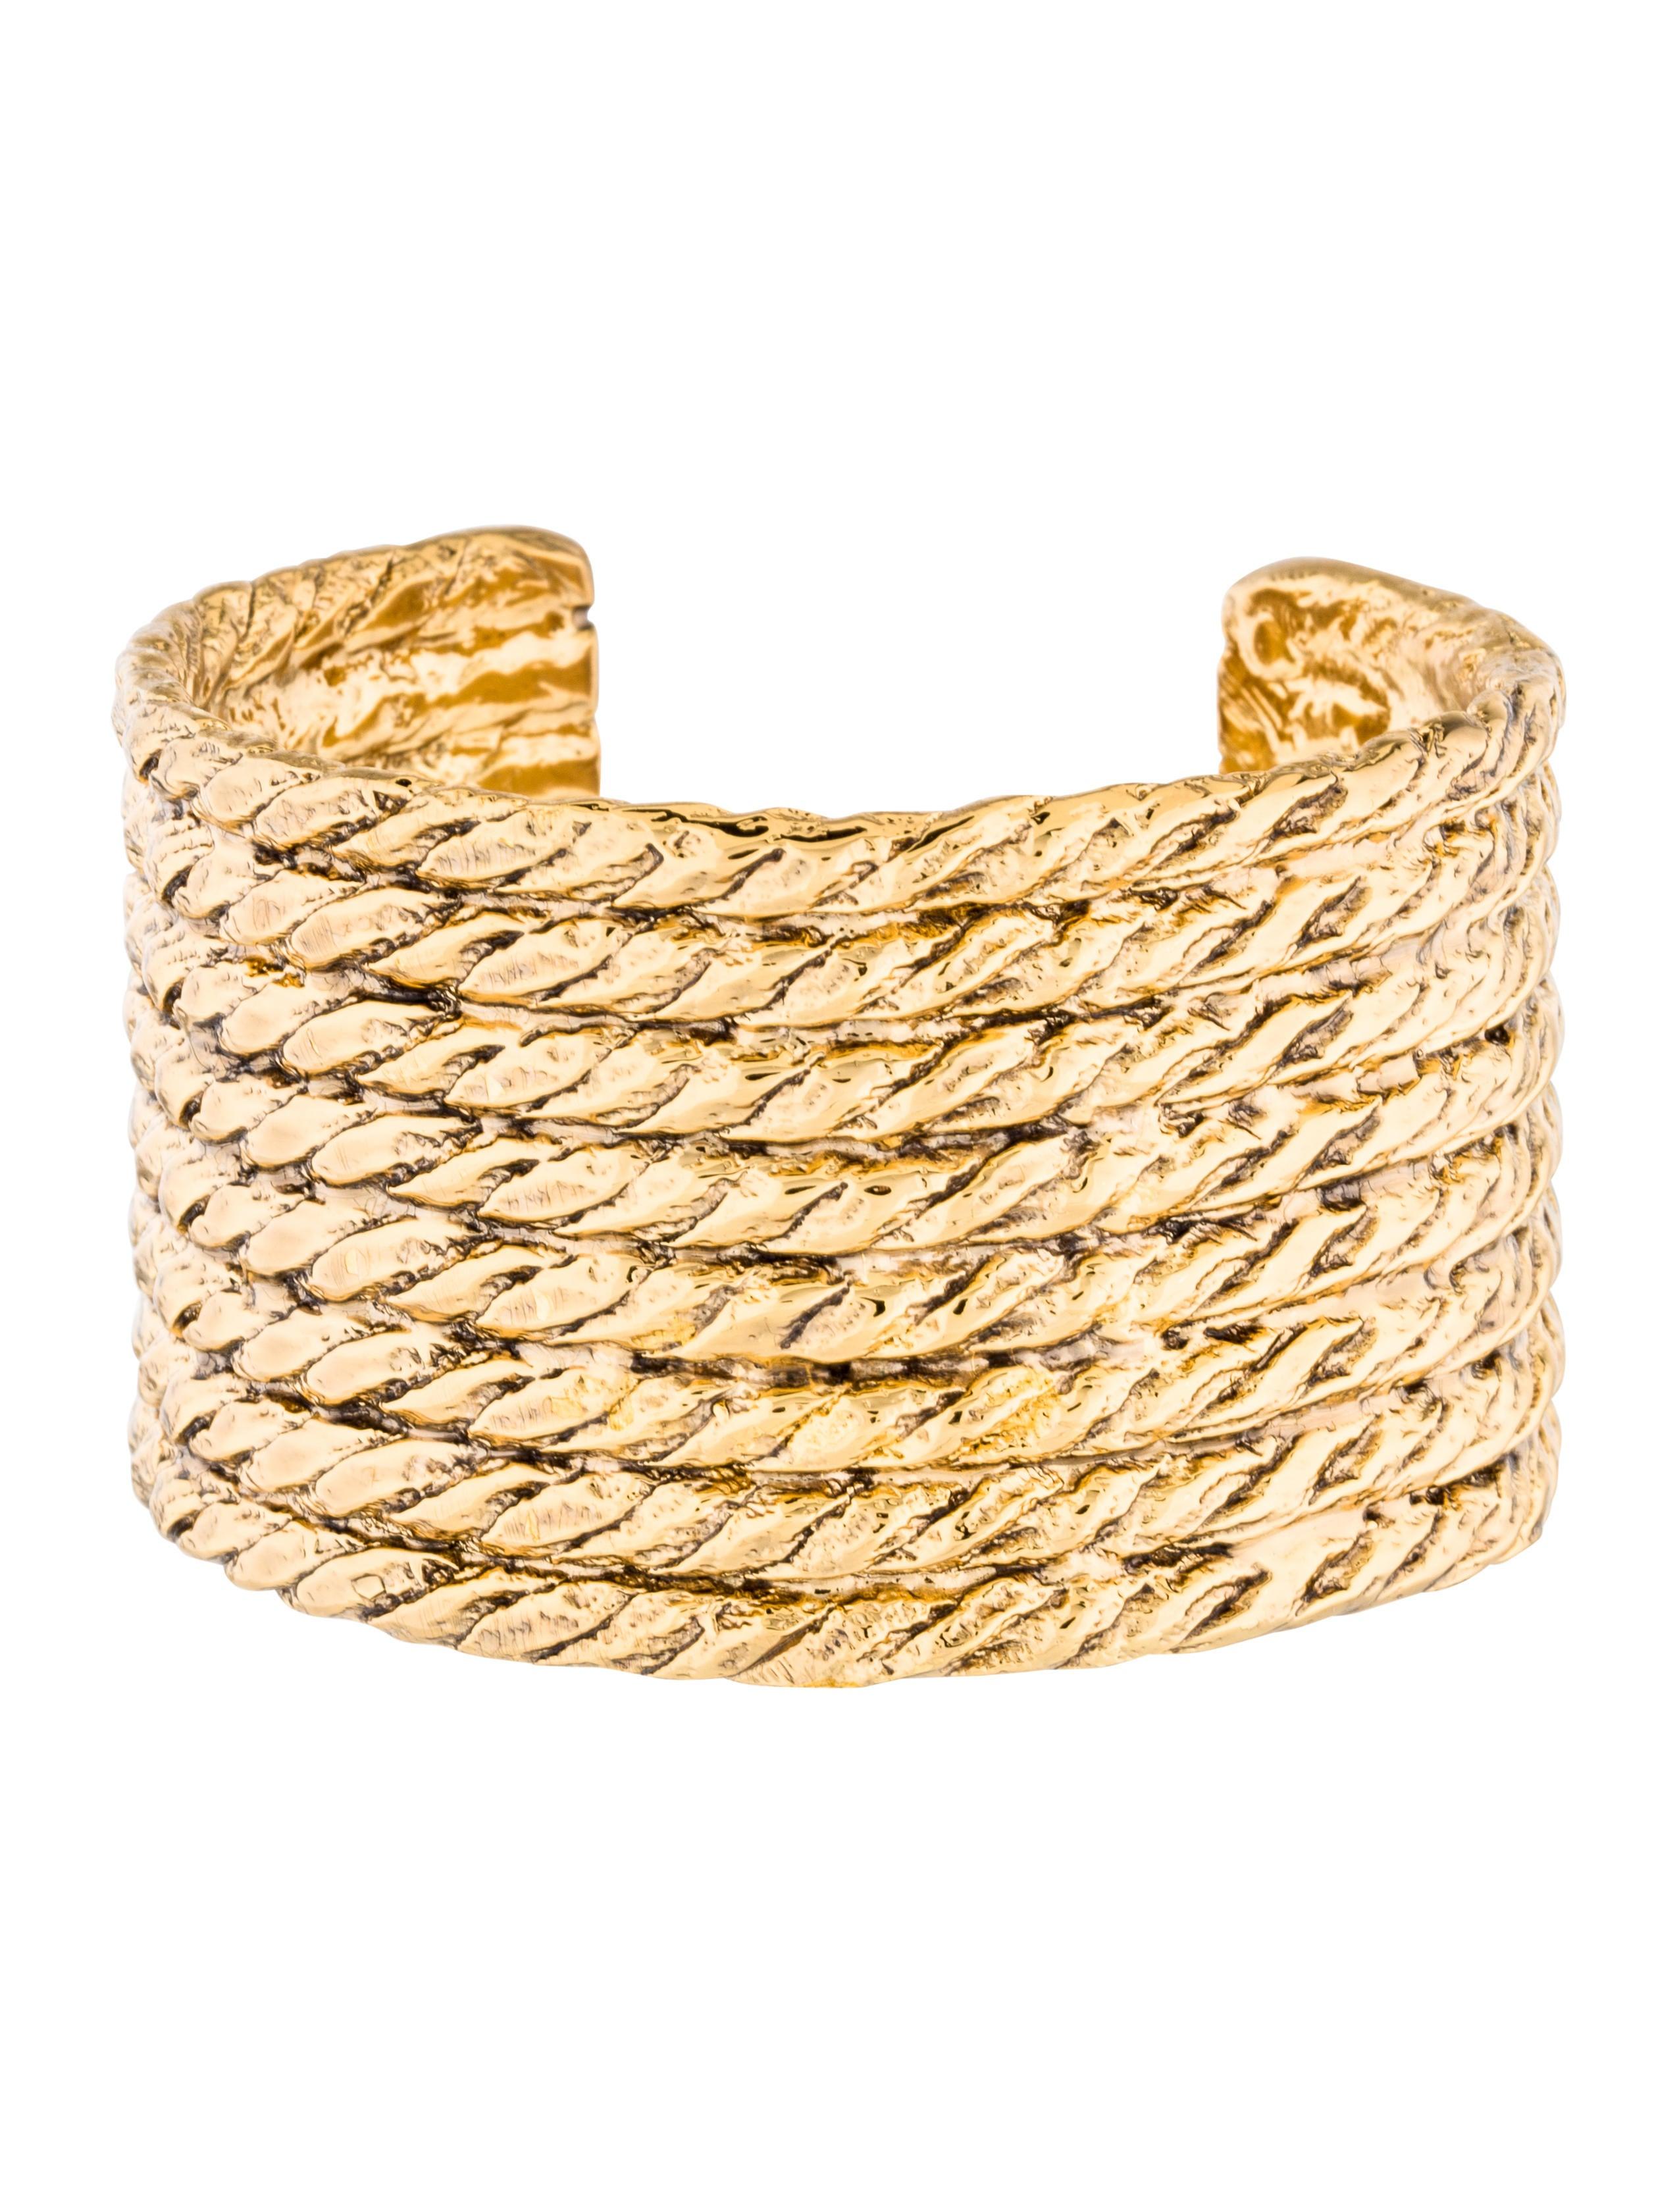 9573b040eef Yves Saint Laurent Rope Cuff - Bracelets - YVE71527 | The RealReal